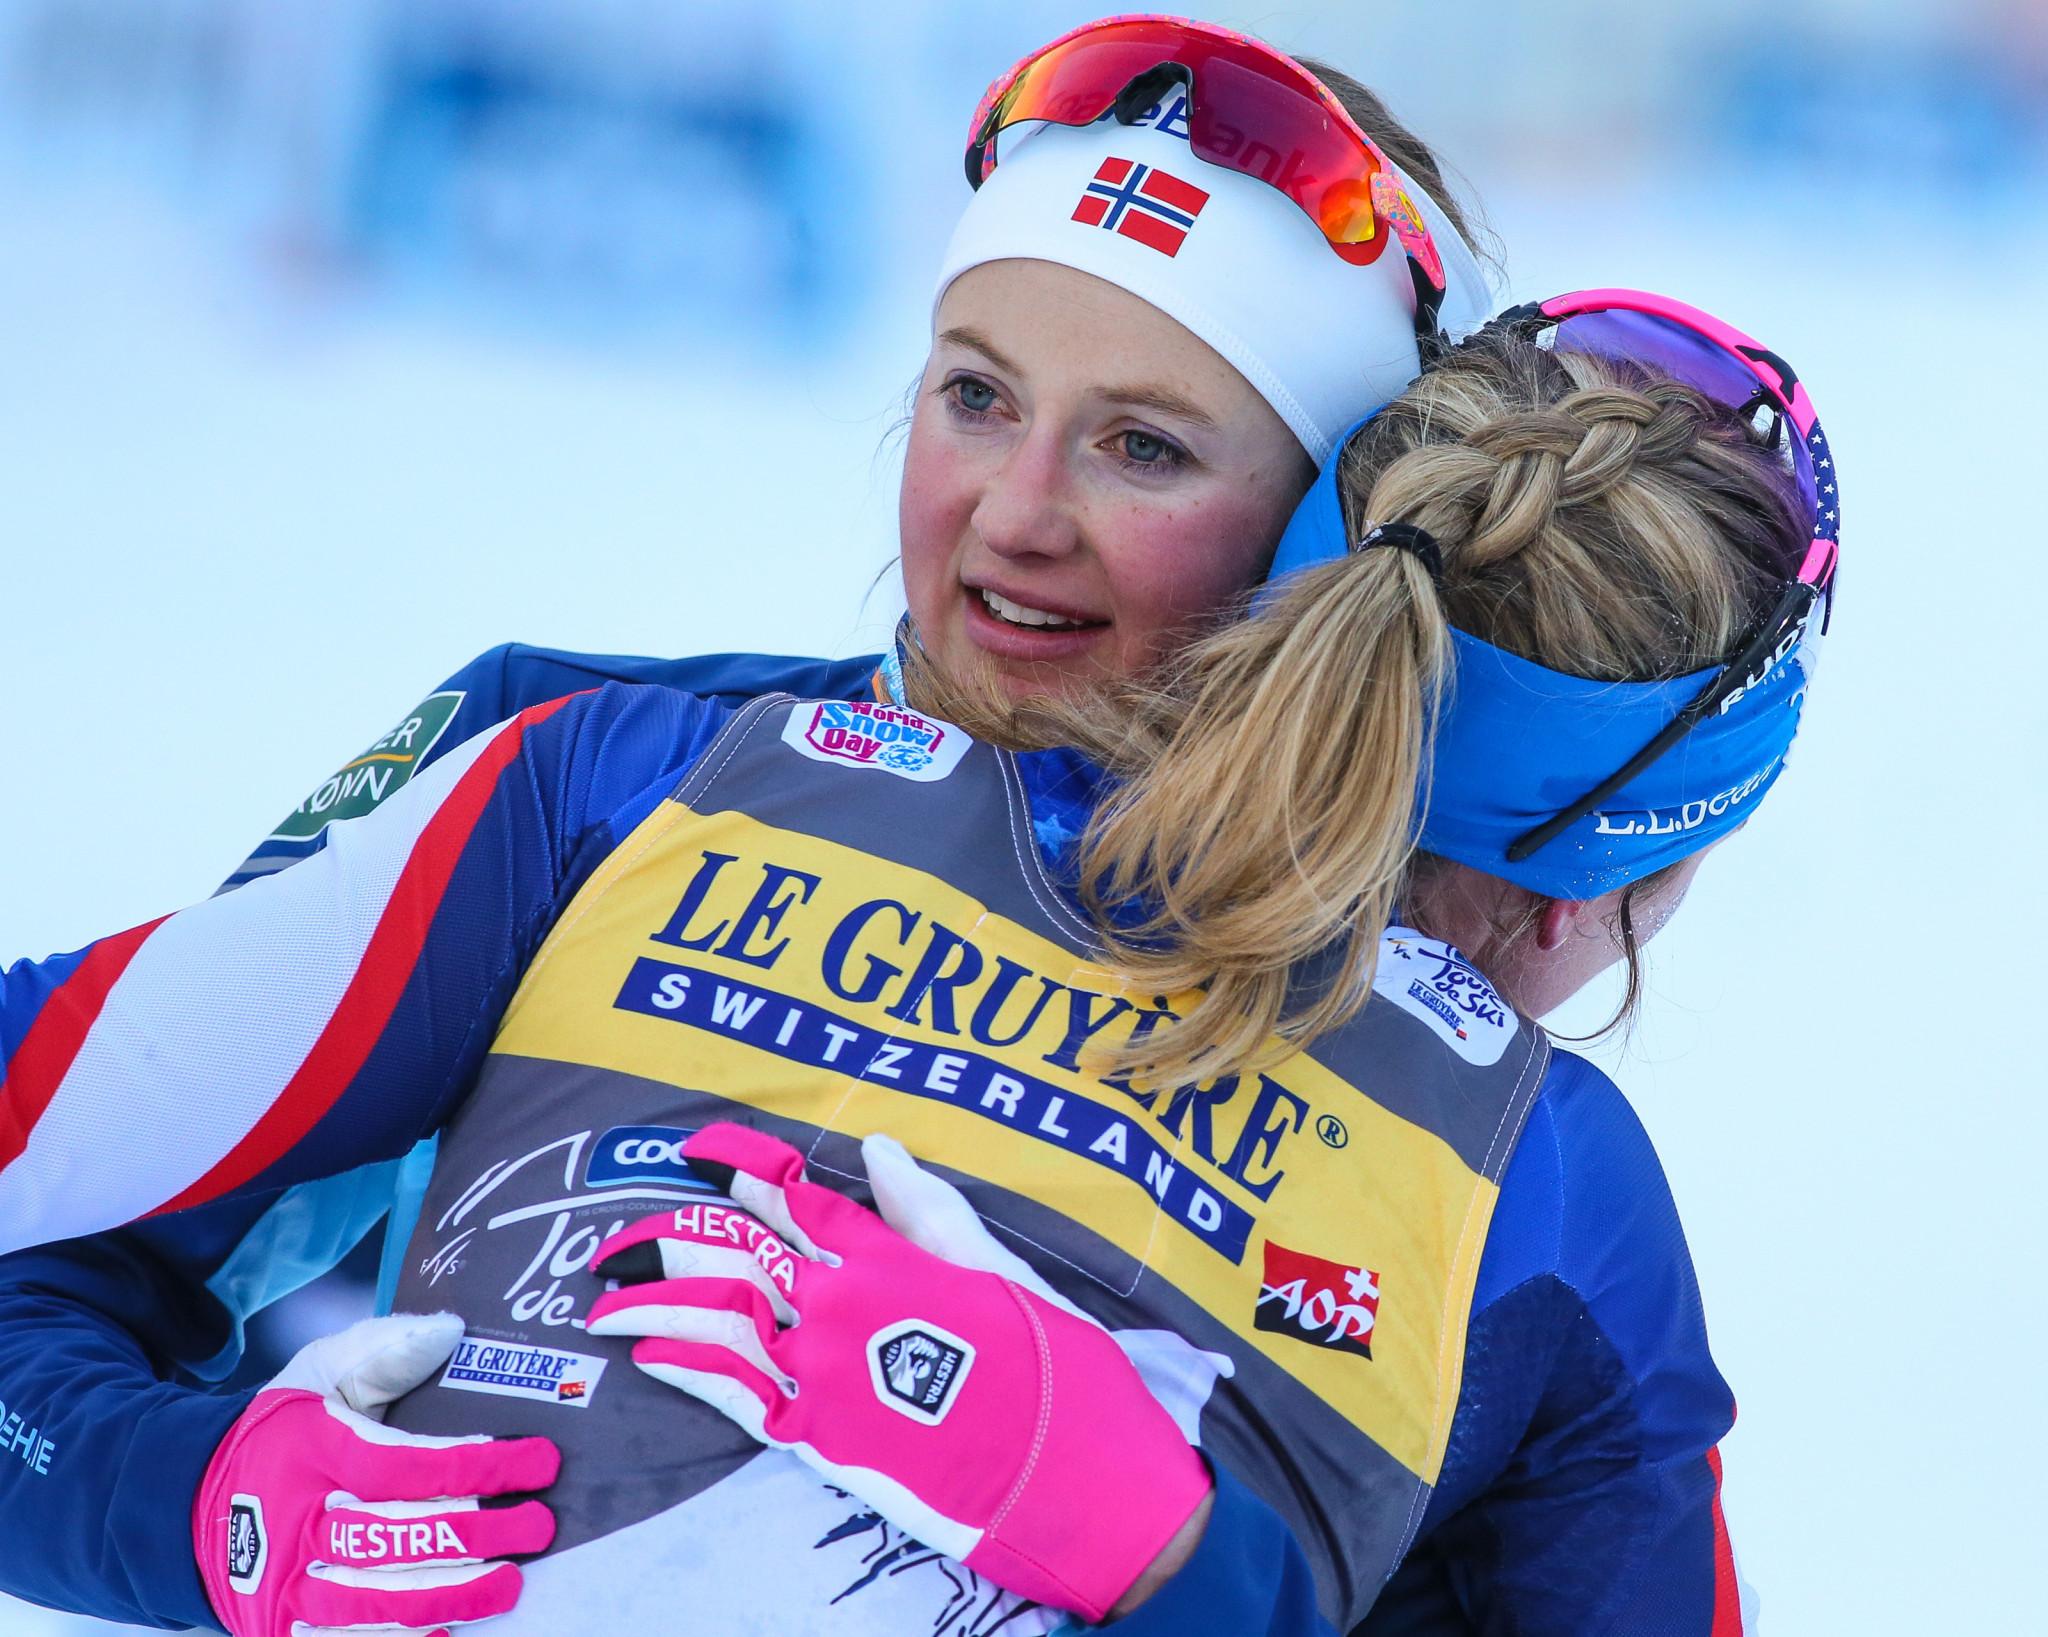 Ingvild Flugstad Østberg is in pole position to win the women's Tour de Ski ©Getty Images